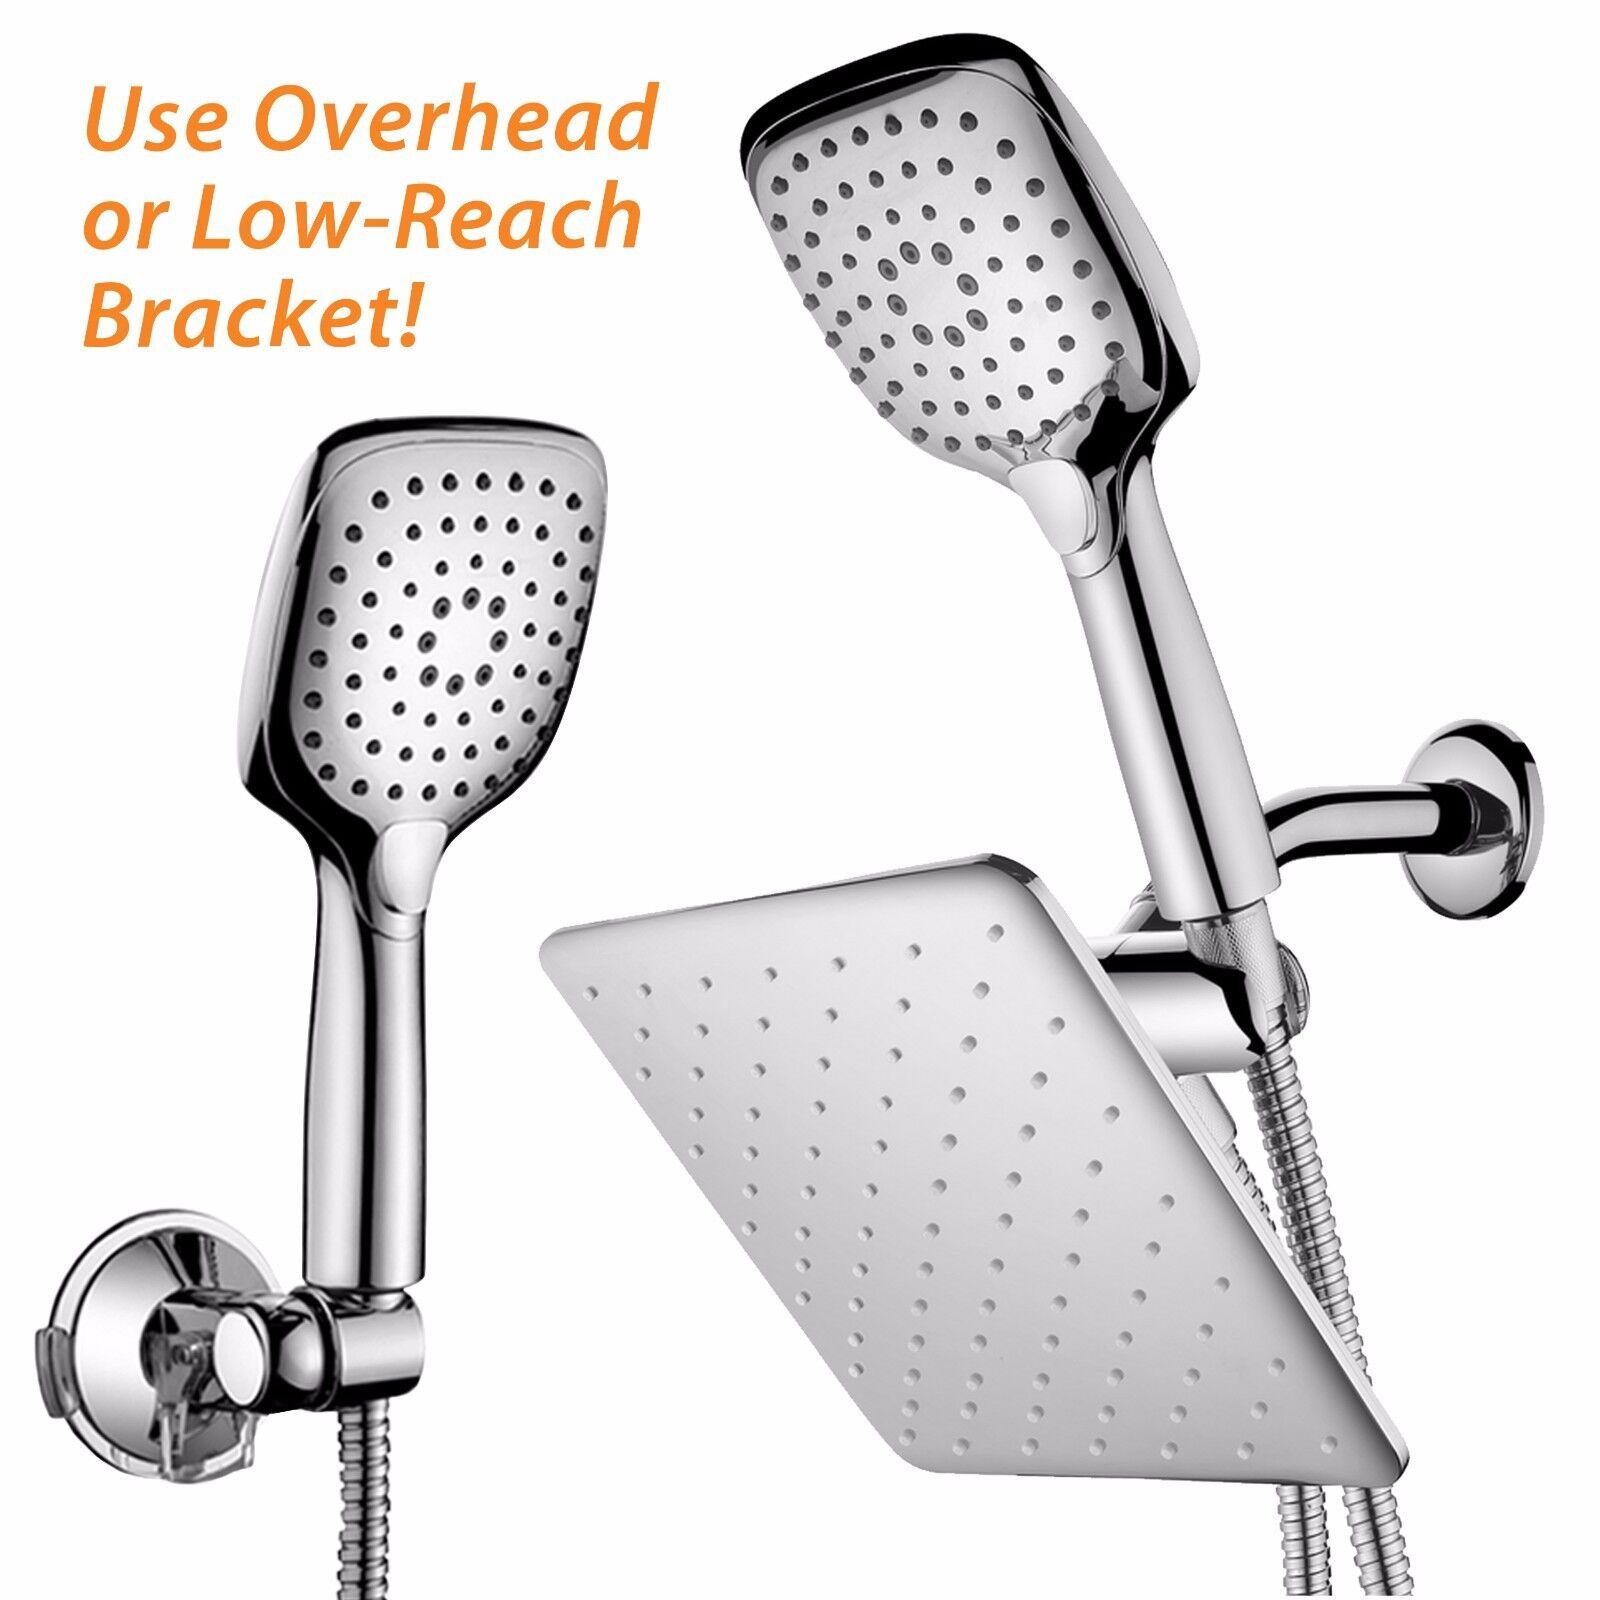 HotelSpa 10.5-in Rain Shower Head/Handheld Combo. Convenient